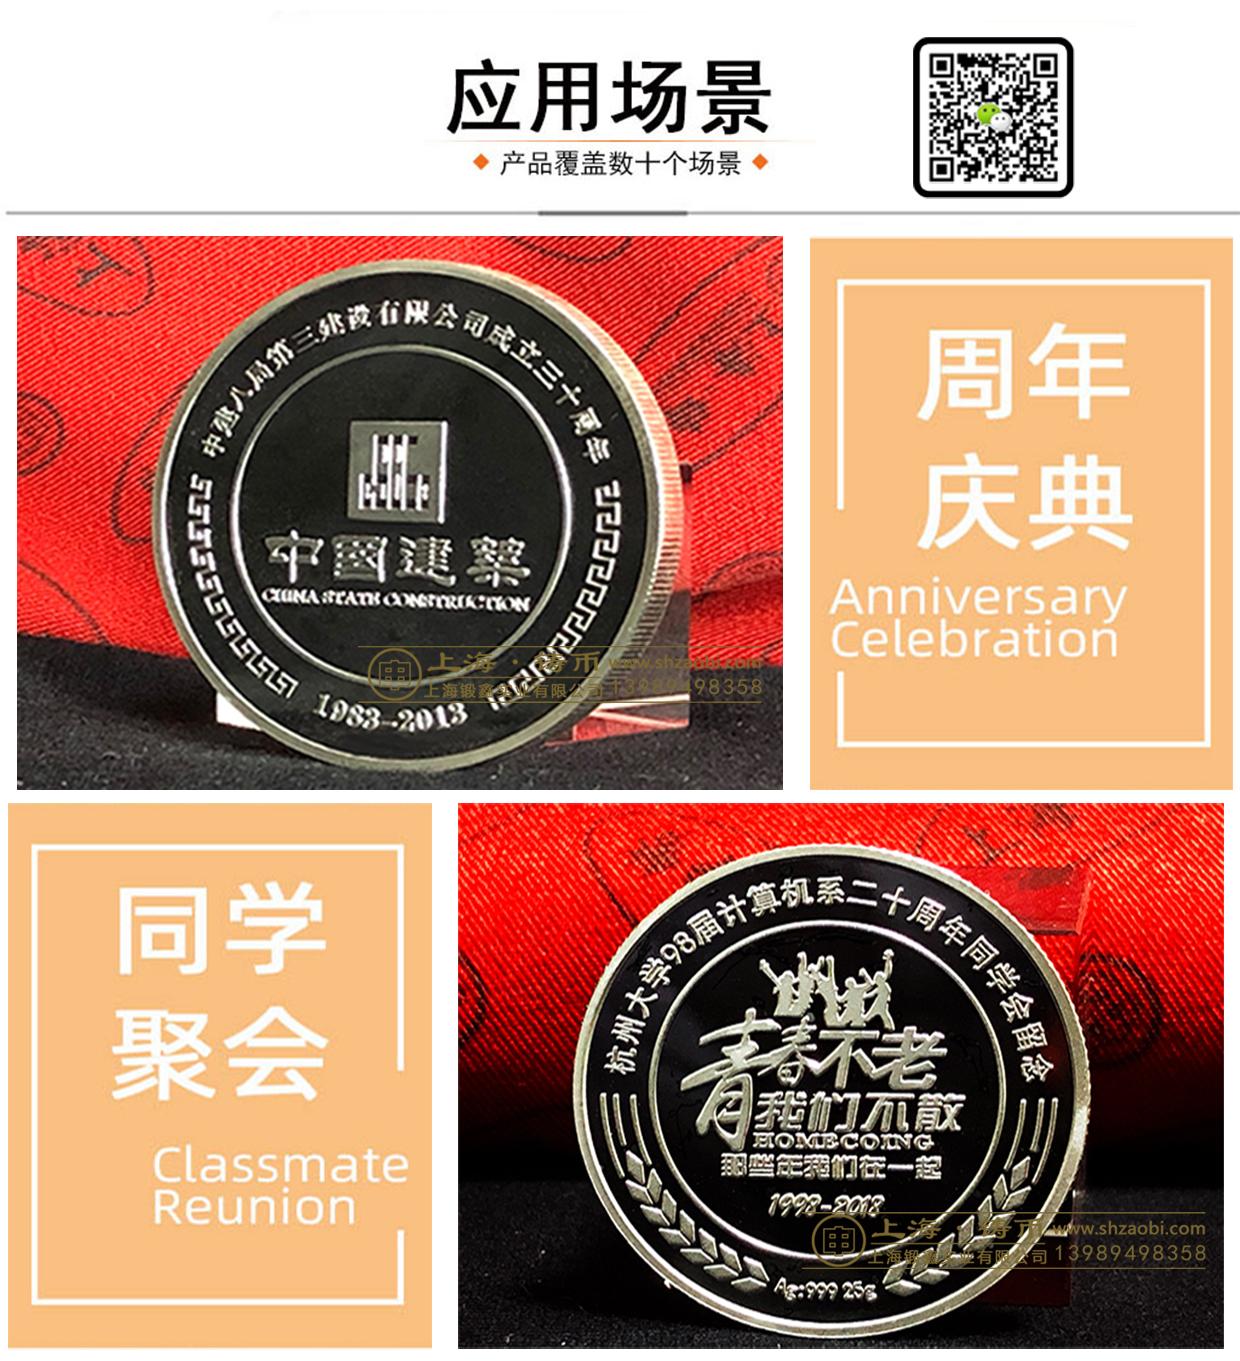 C-_Users_上海铸币-杭州_Desktop_第二页.jpg